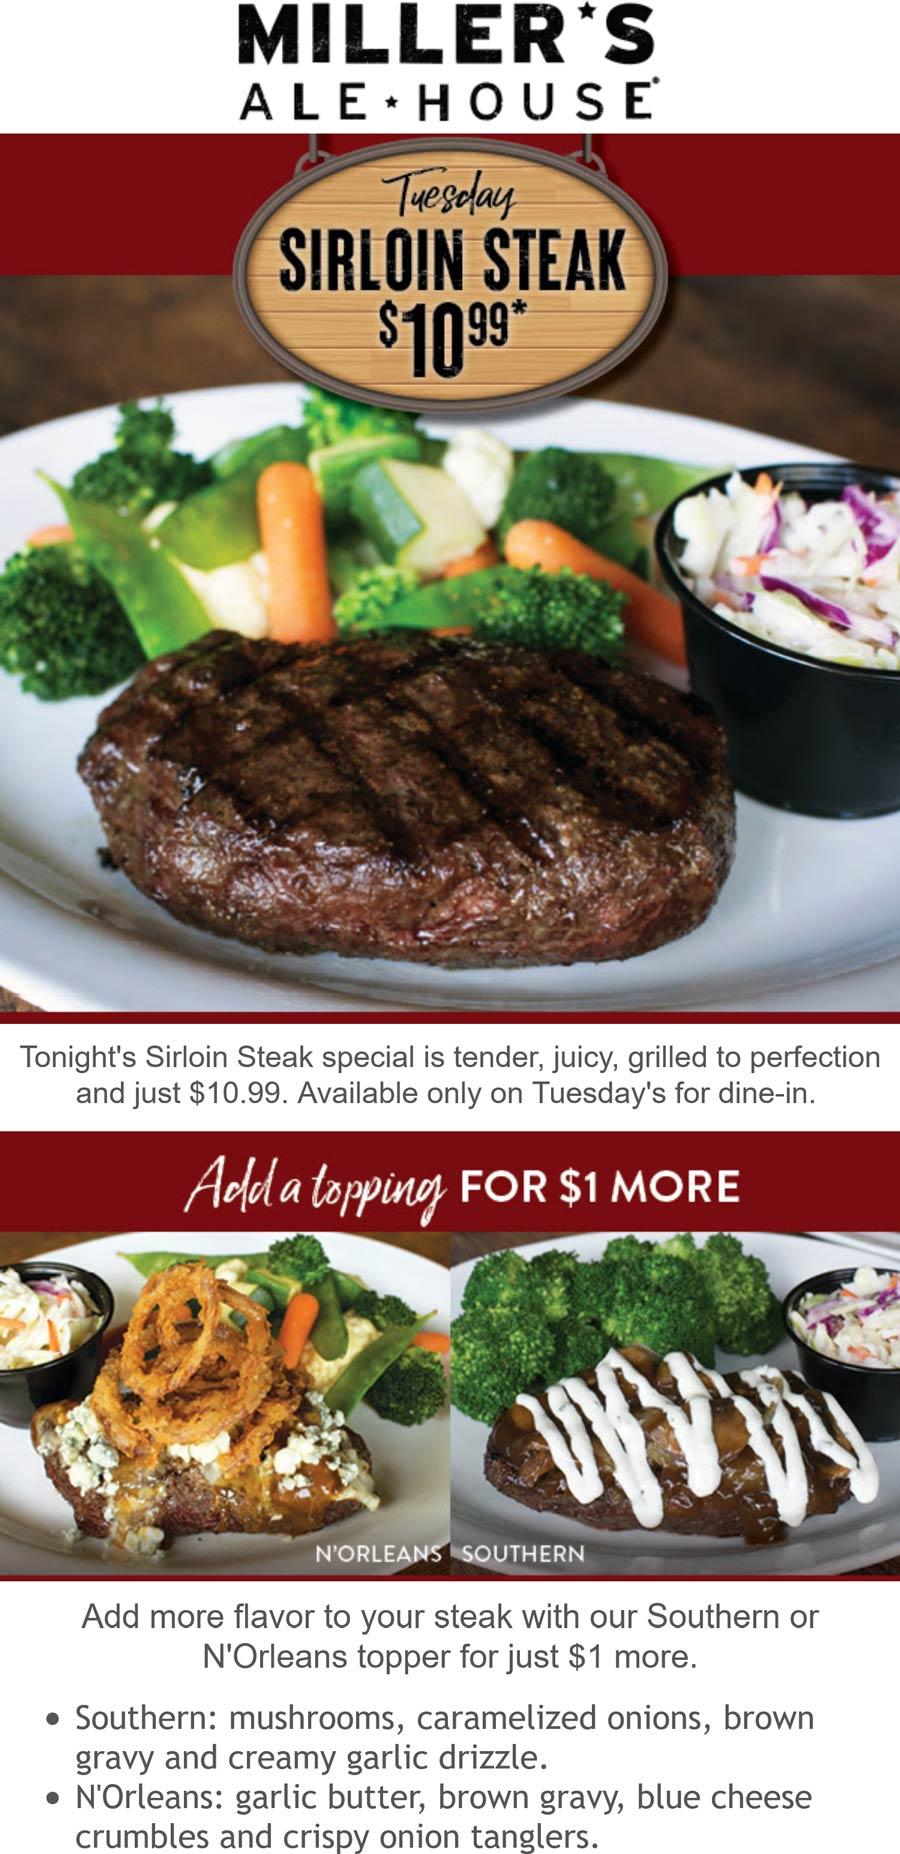 Millers Ale House restaurants Coupon  $11 sirloin steak meal Tuesdays at Millers Ale House #millersalehouse